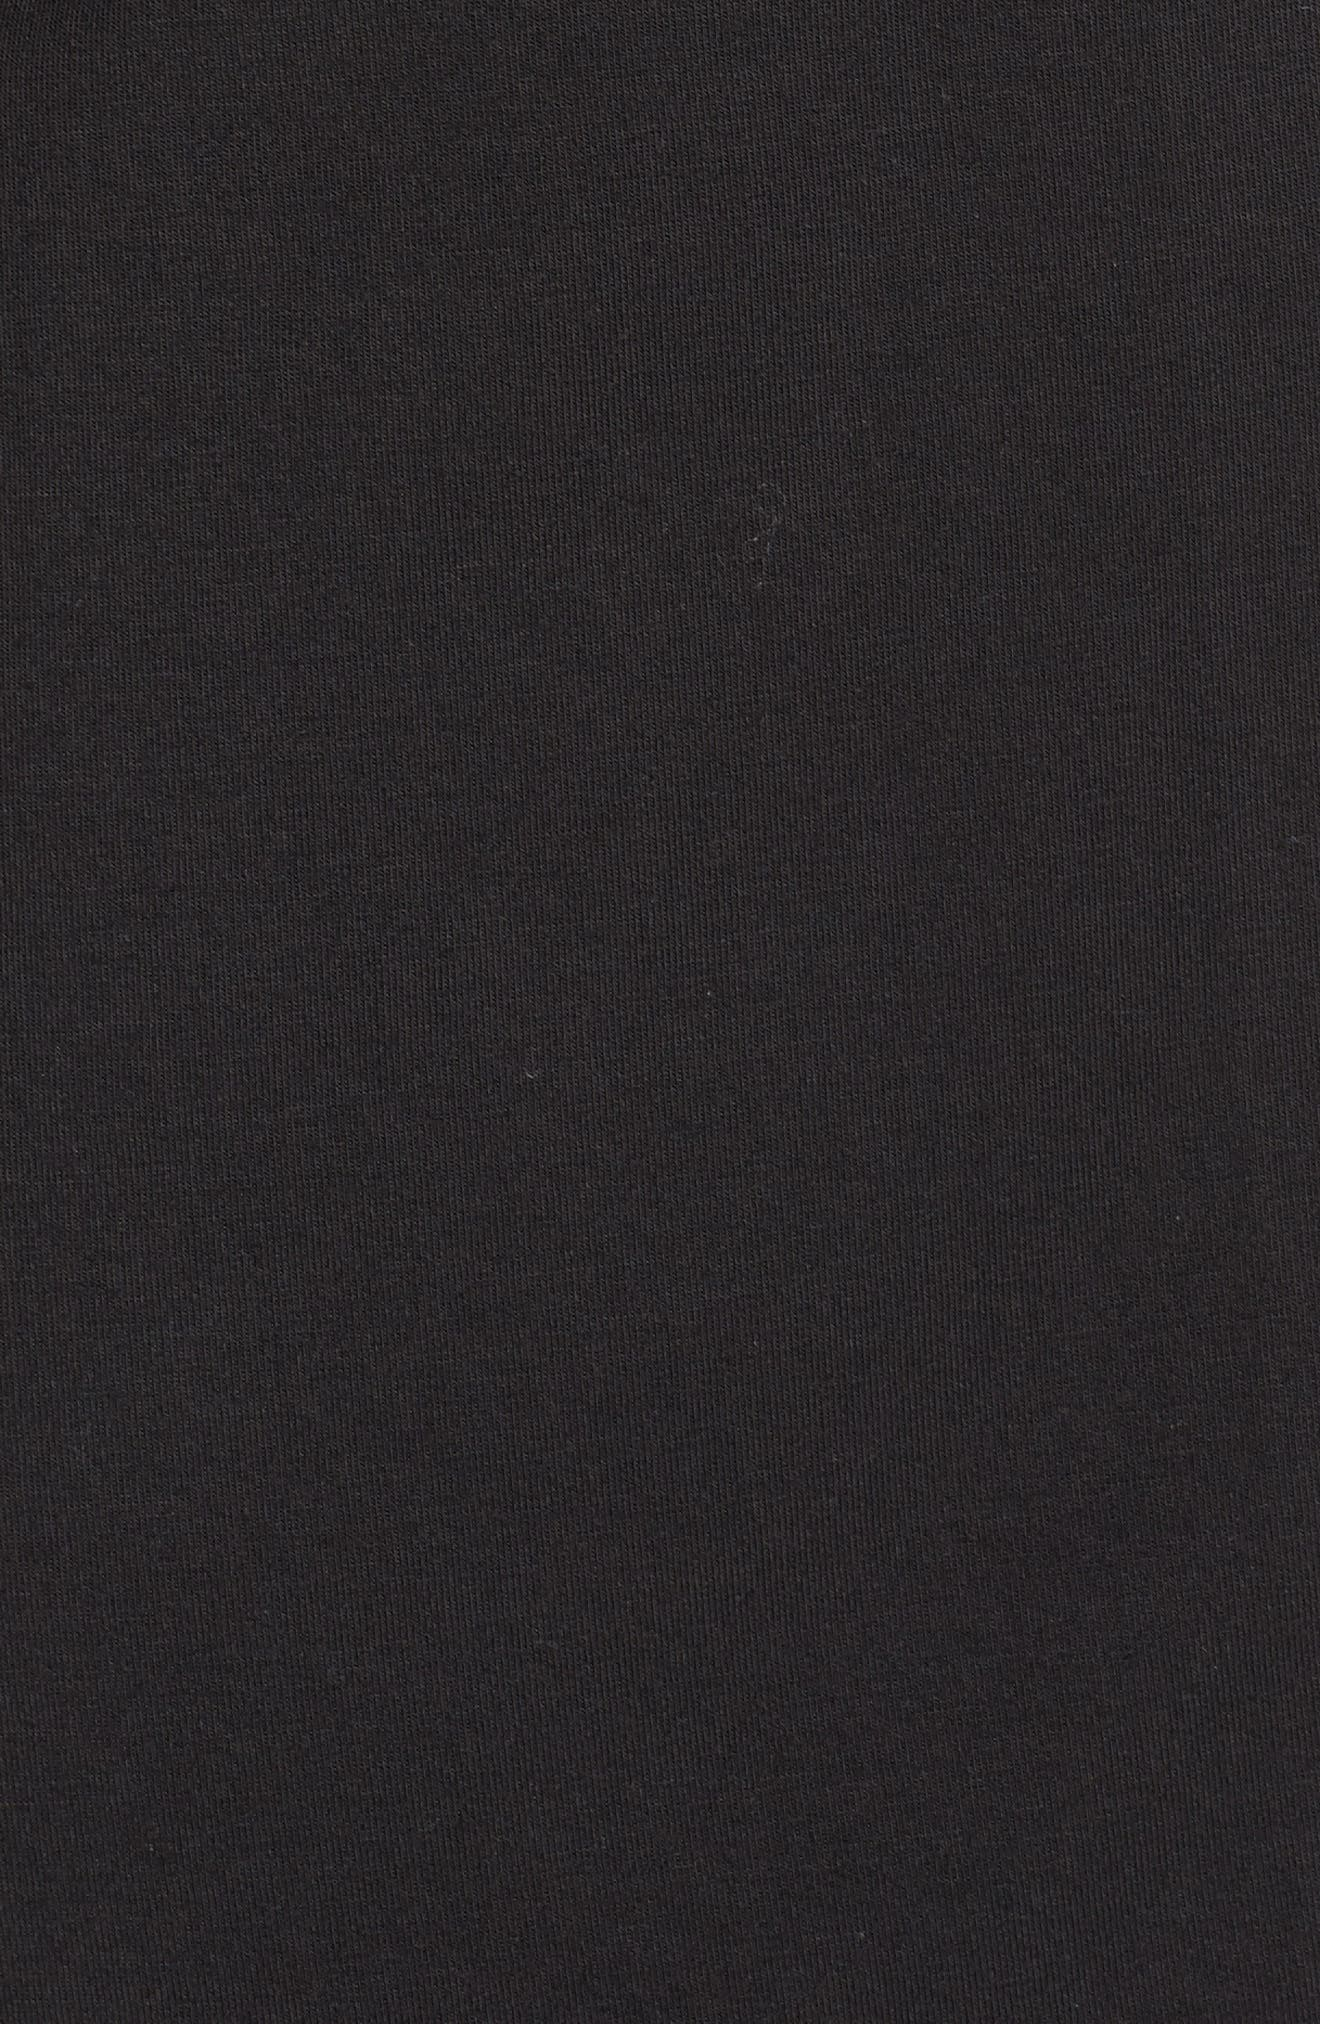 NORDSTROM LINGERIE,                             Moonlight Pajamas,                             Alternate thumbnail 5, color,                             BLACK